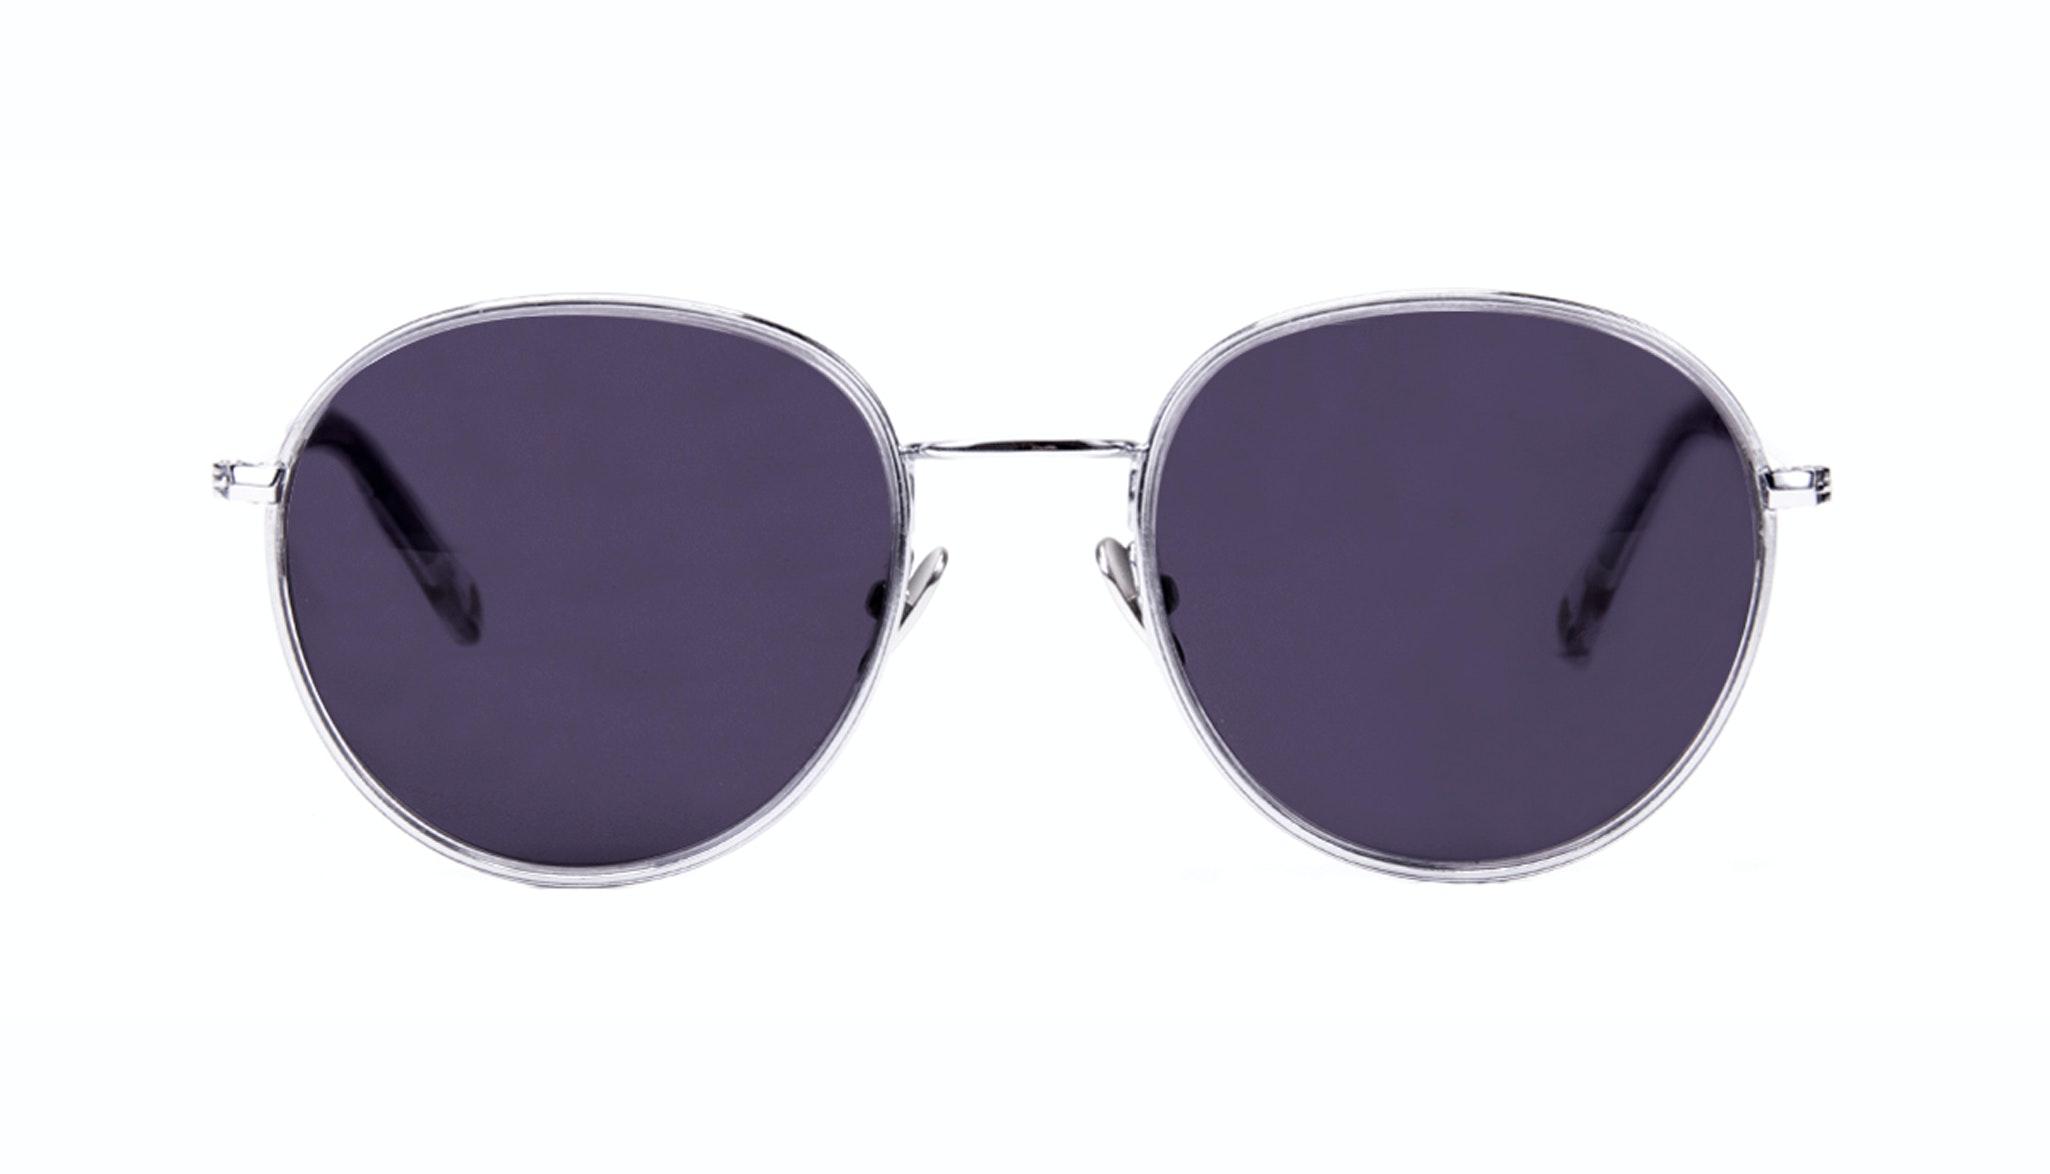 Affordable Fashion Glasses Aviator Round Sunglasses Women Subrosa Glacier